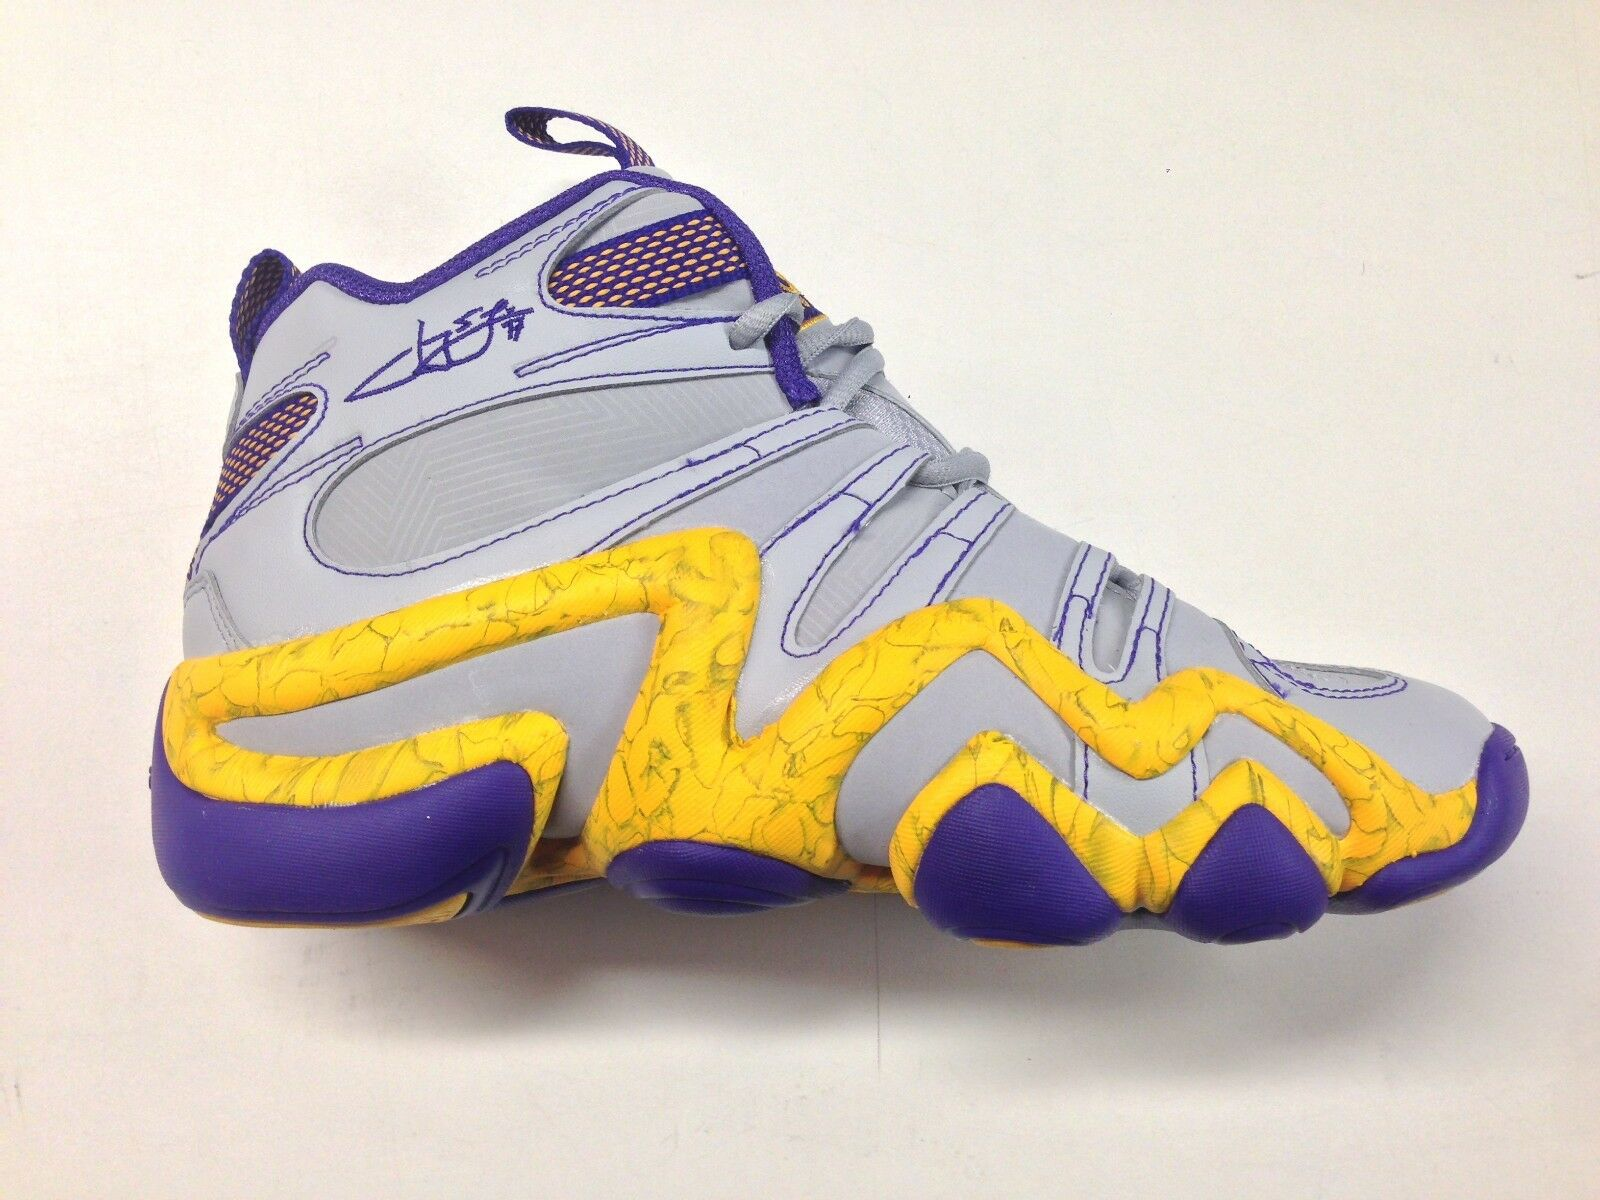 Adidas jeremy lin grau - gelben kobe crazy 8 - lakers turnschuhe c77701 1702-92